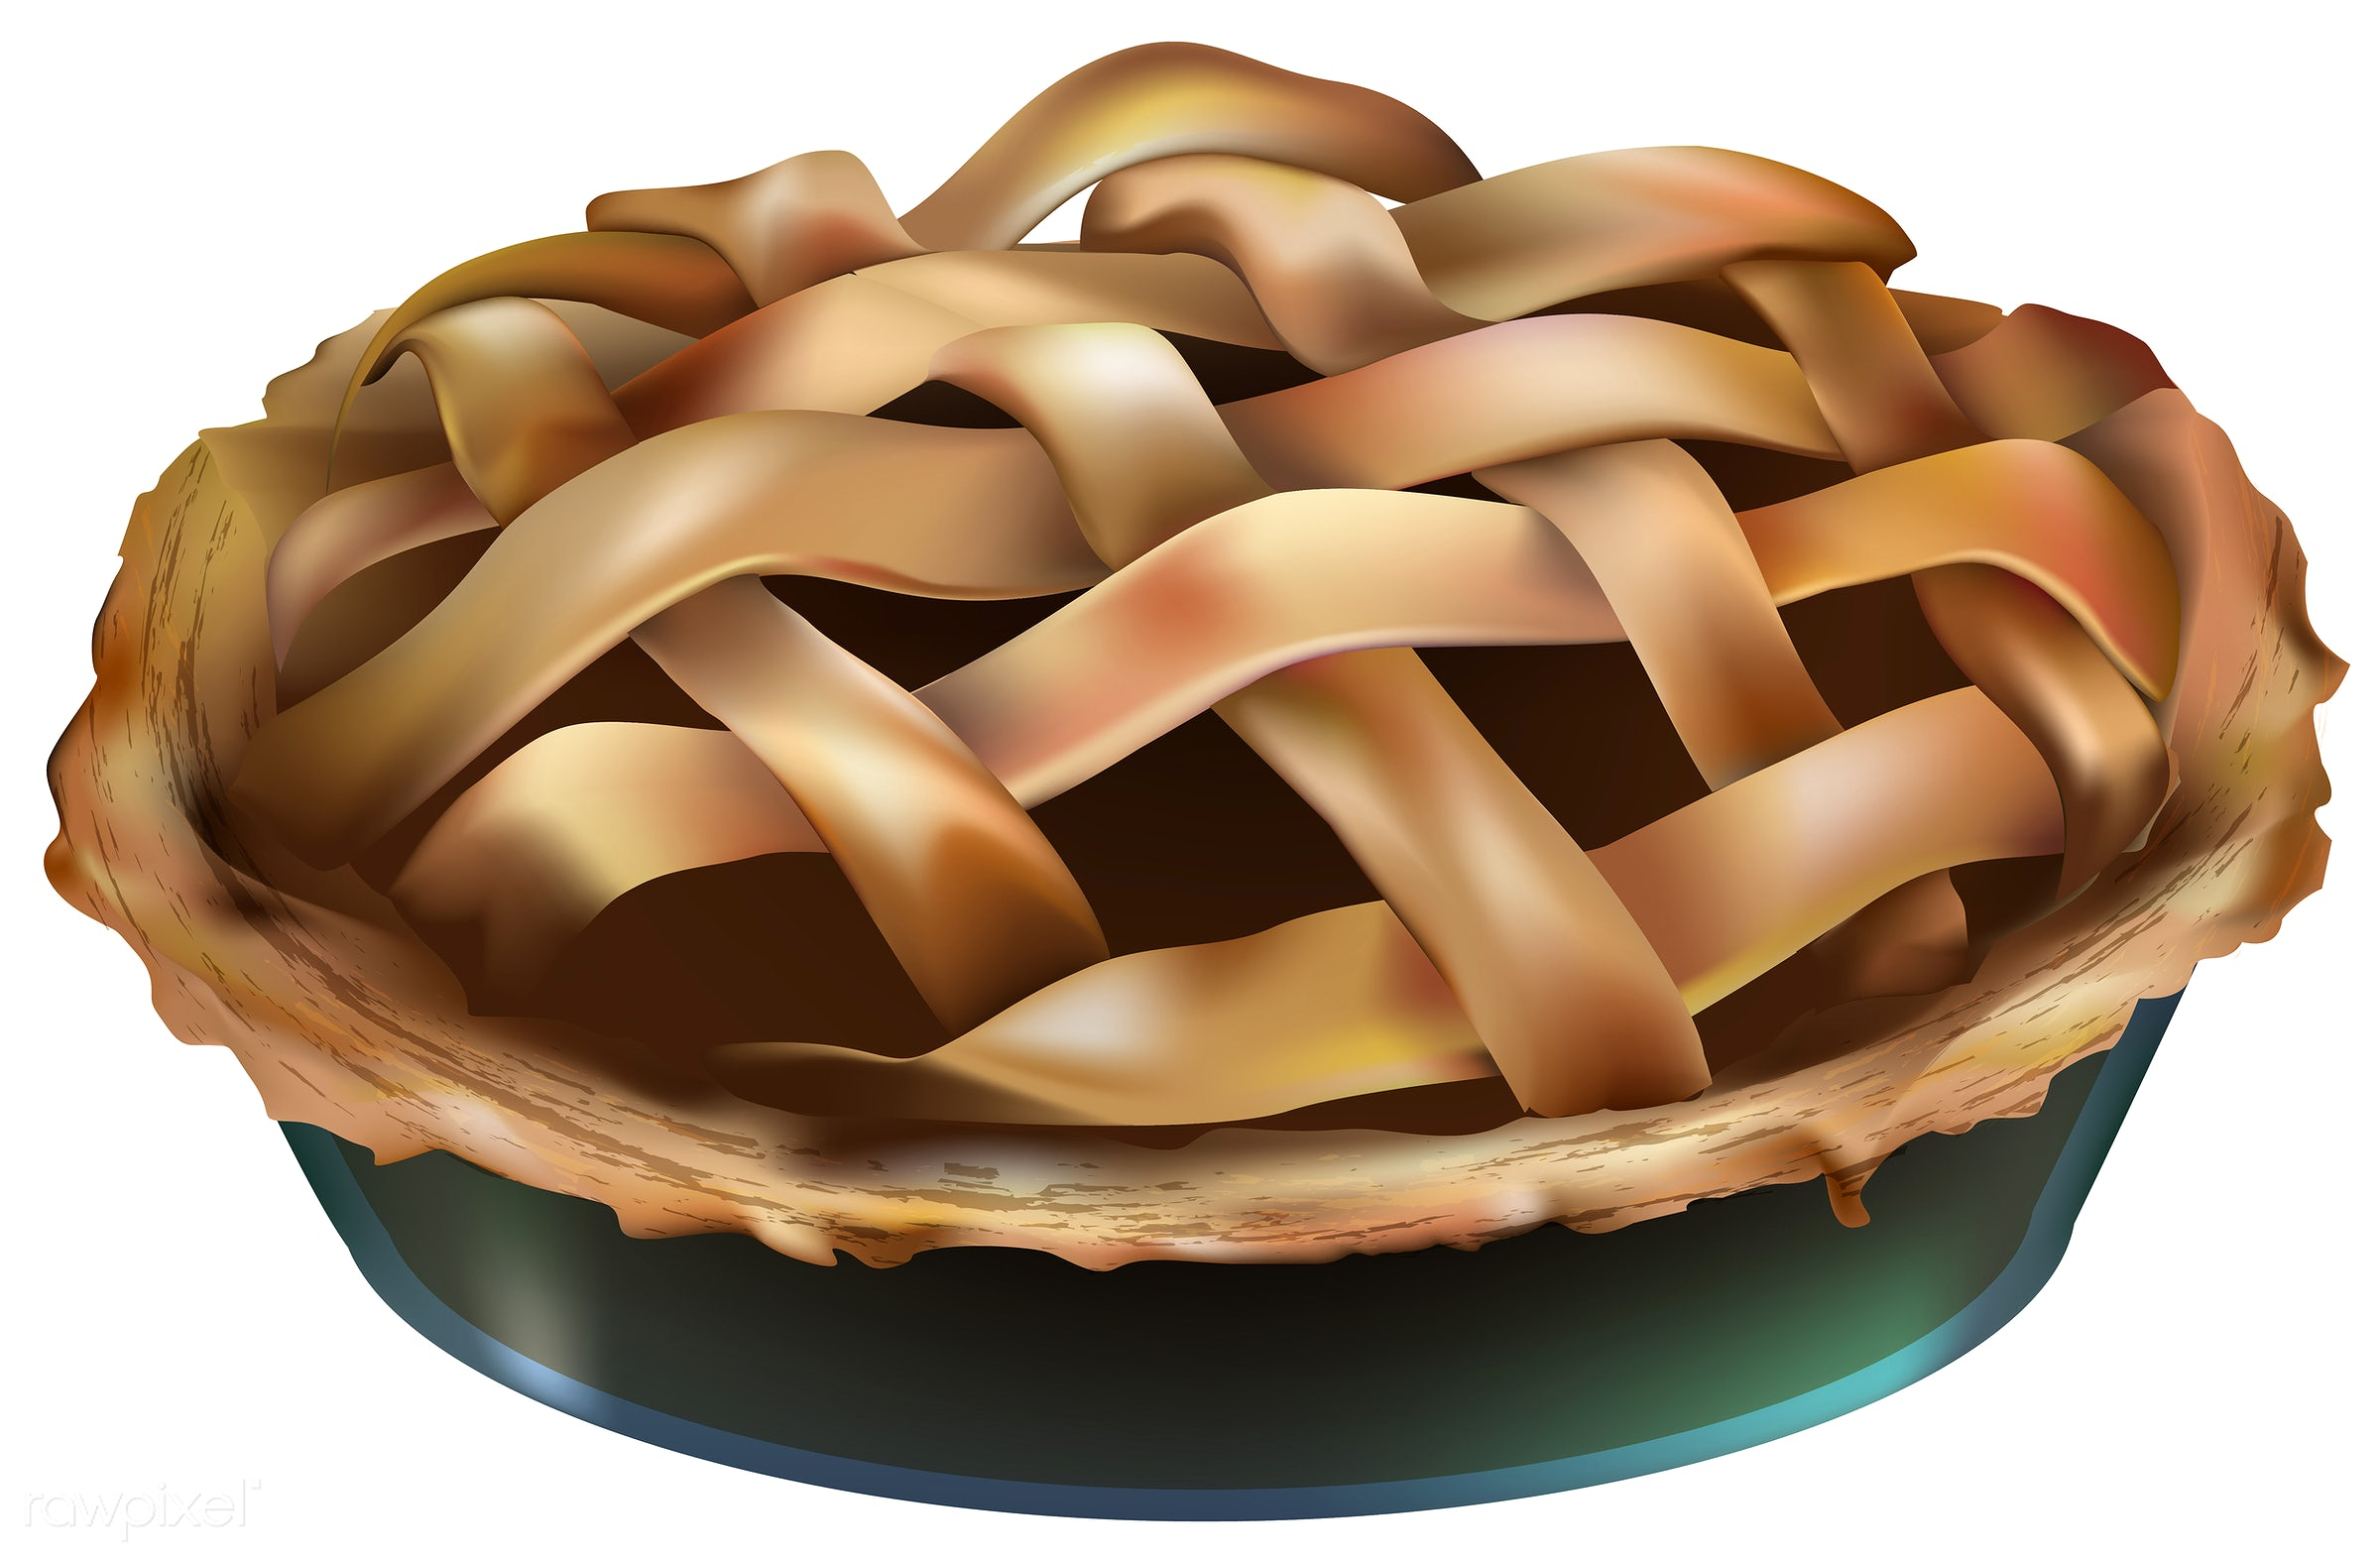 Illustration of pie isolated on white background - illustration, pie, autumn, celebration, crops, dessert, elements, fall,...